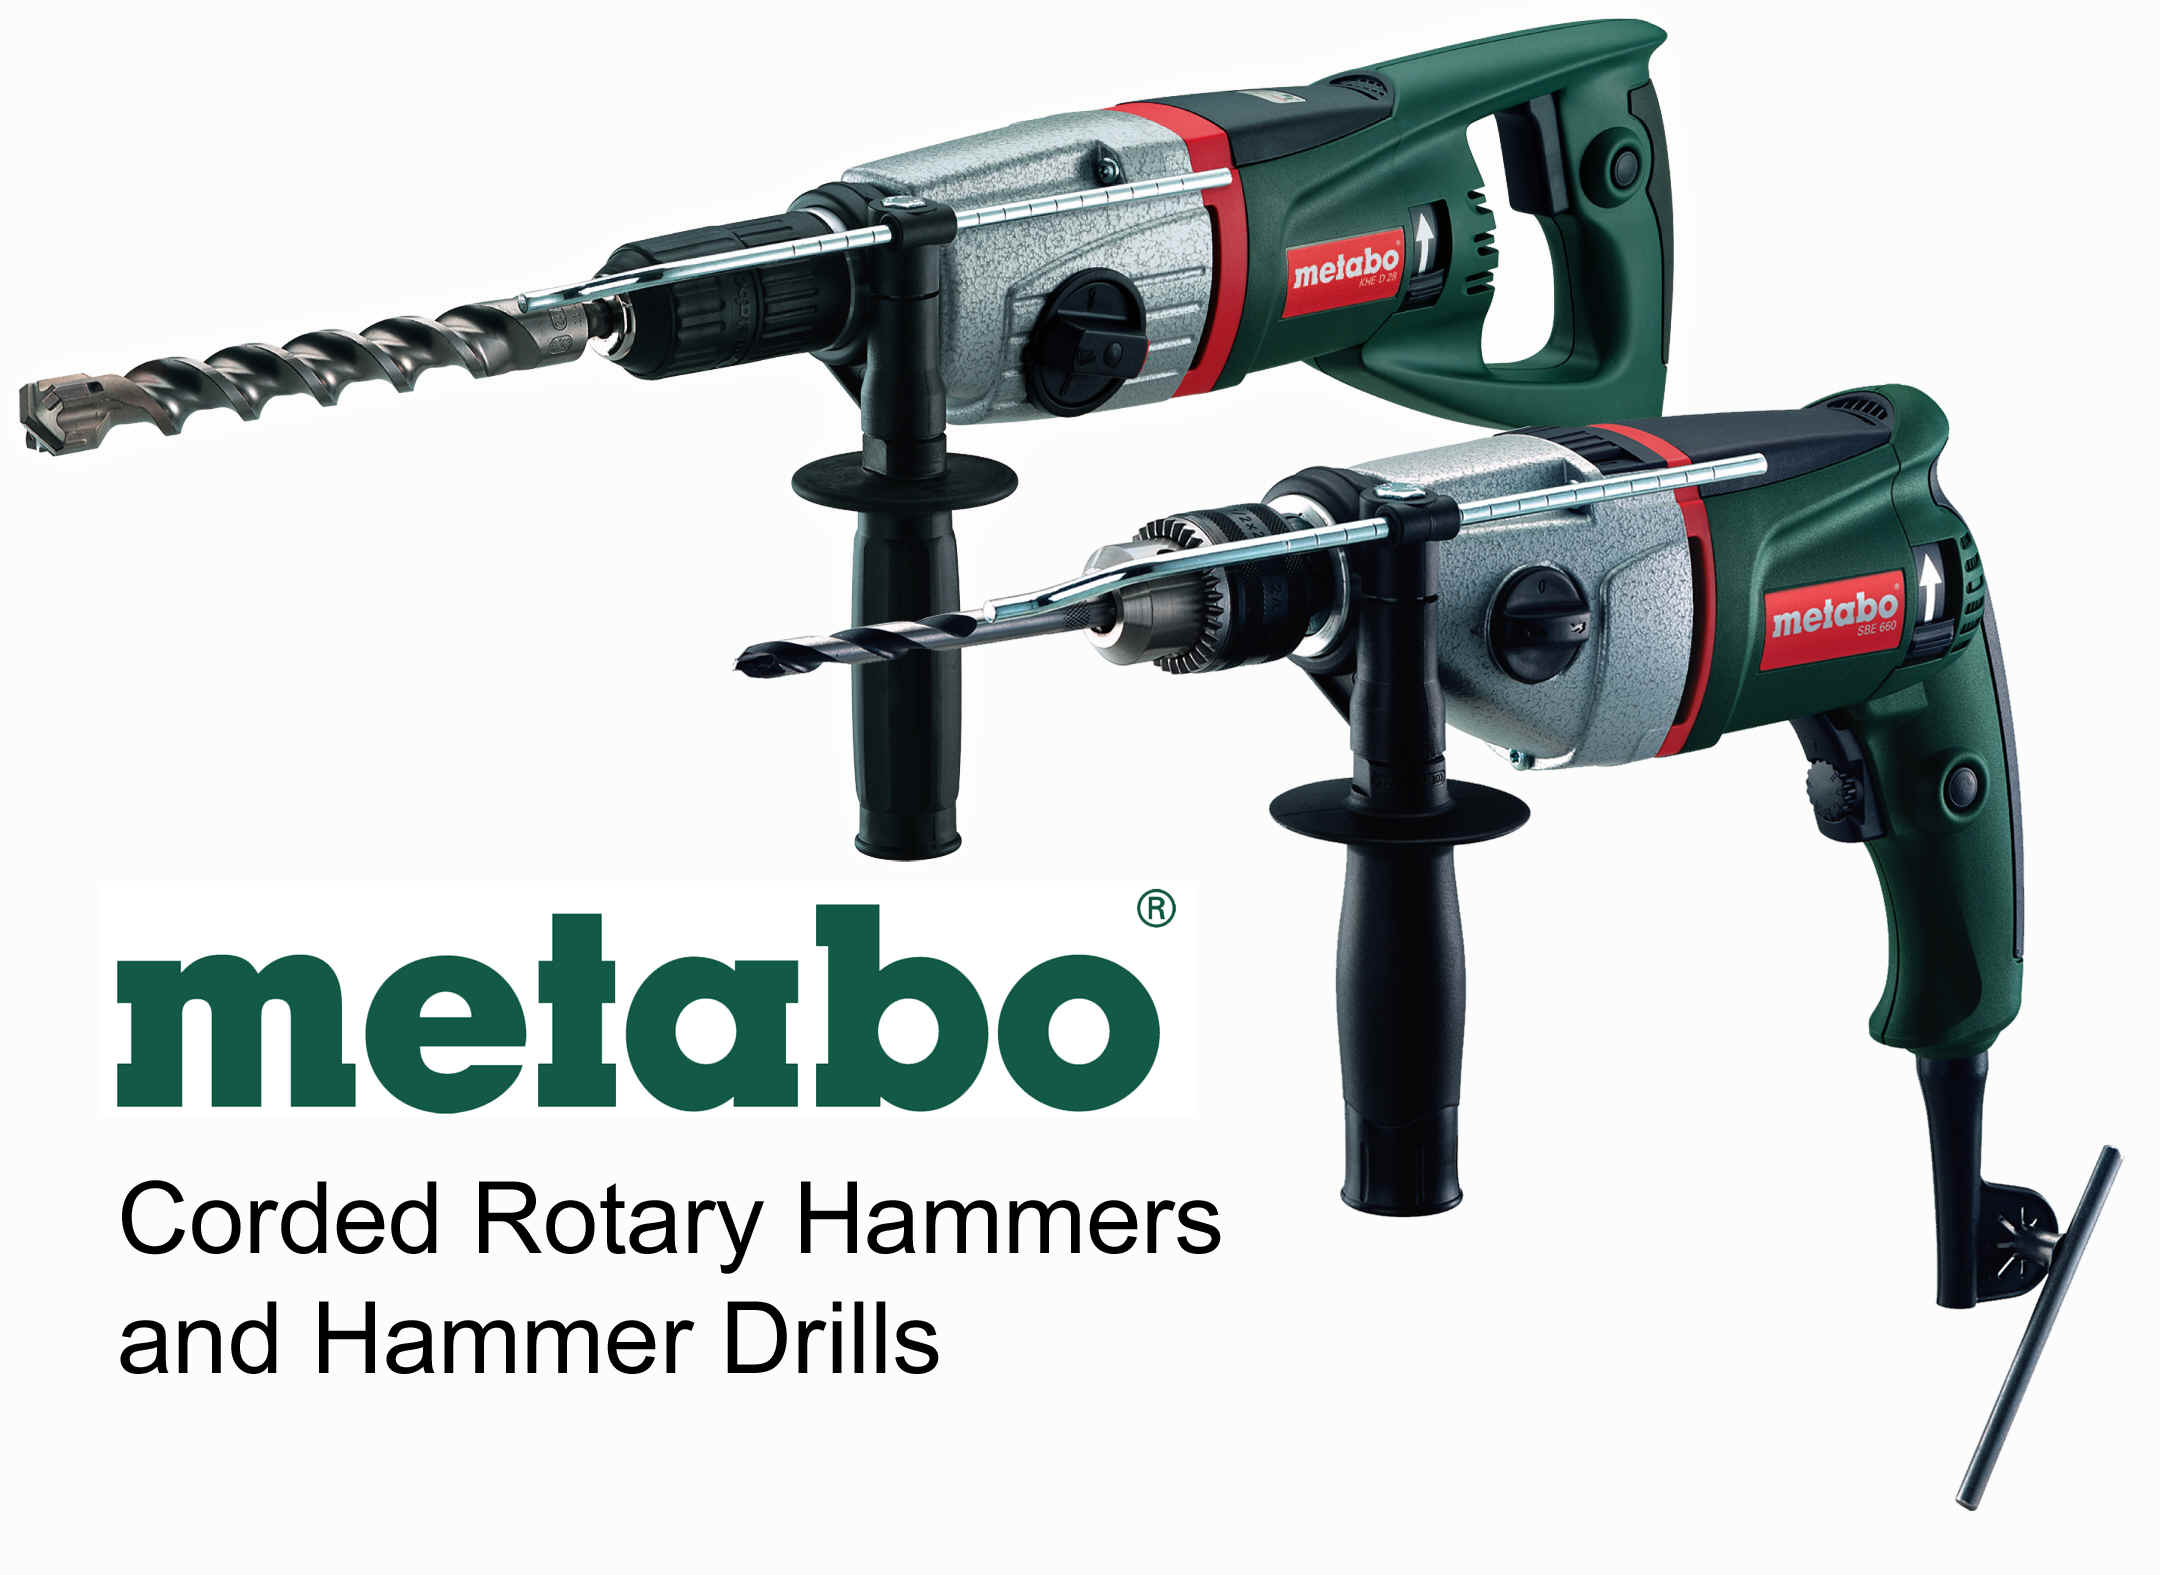 Metabo Power Tools